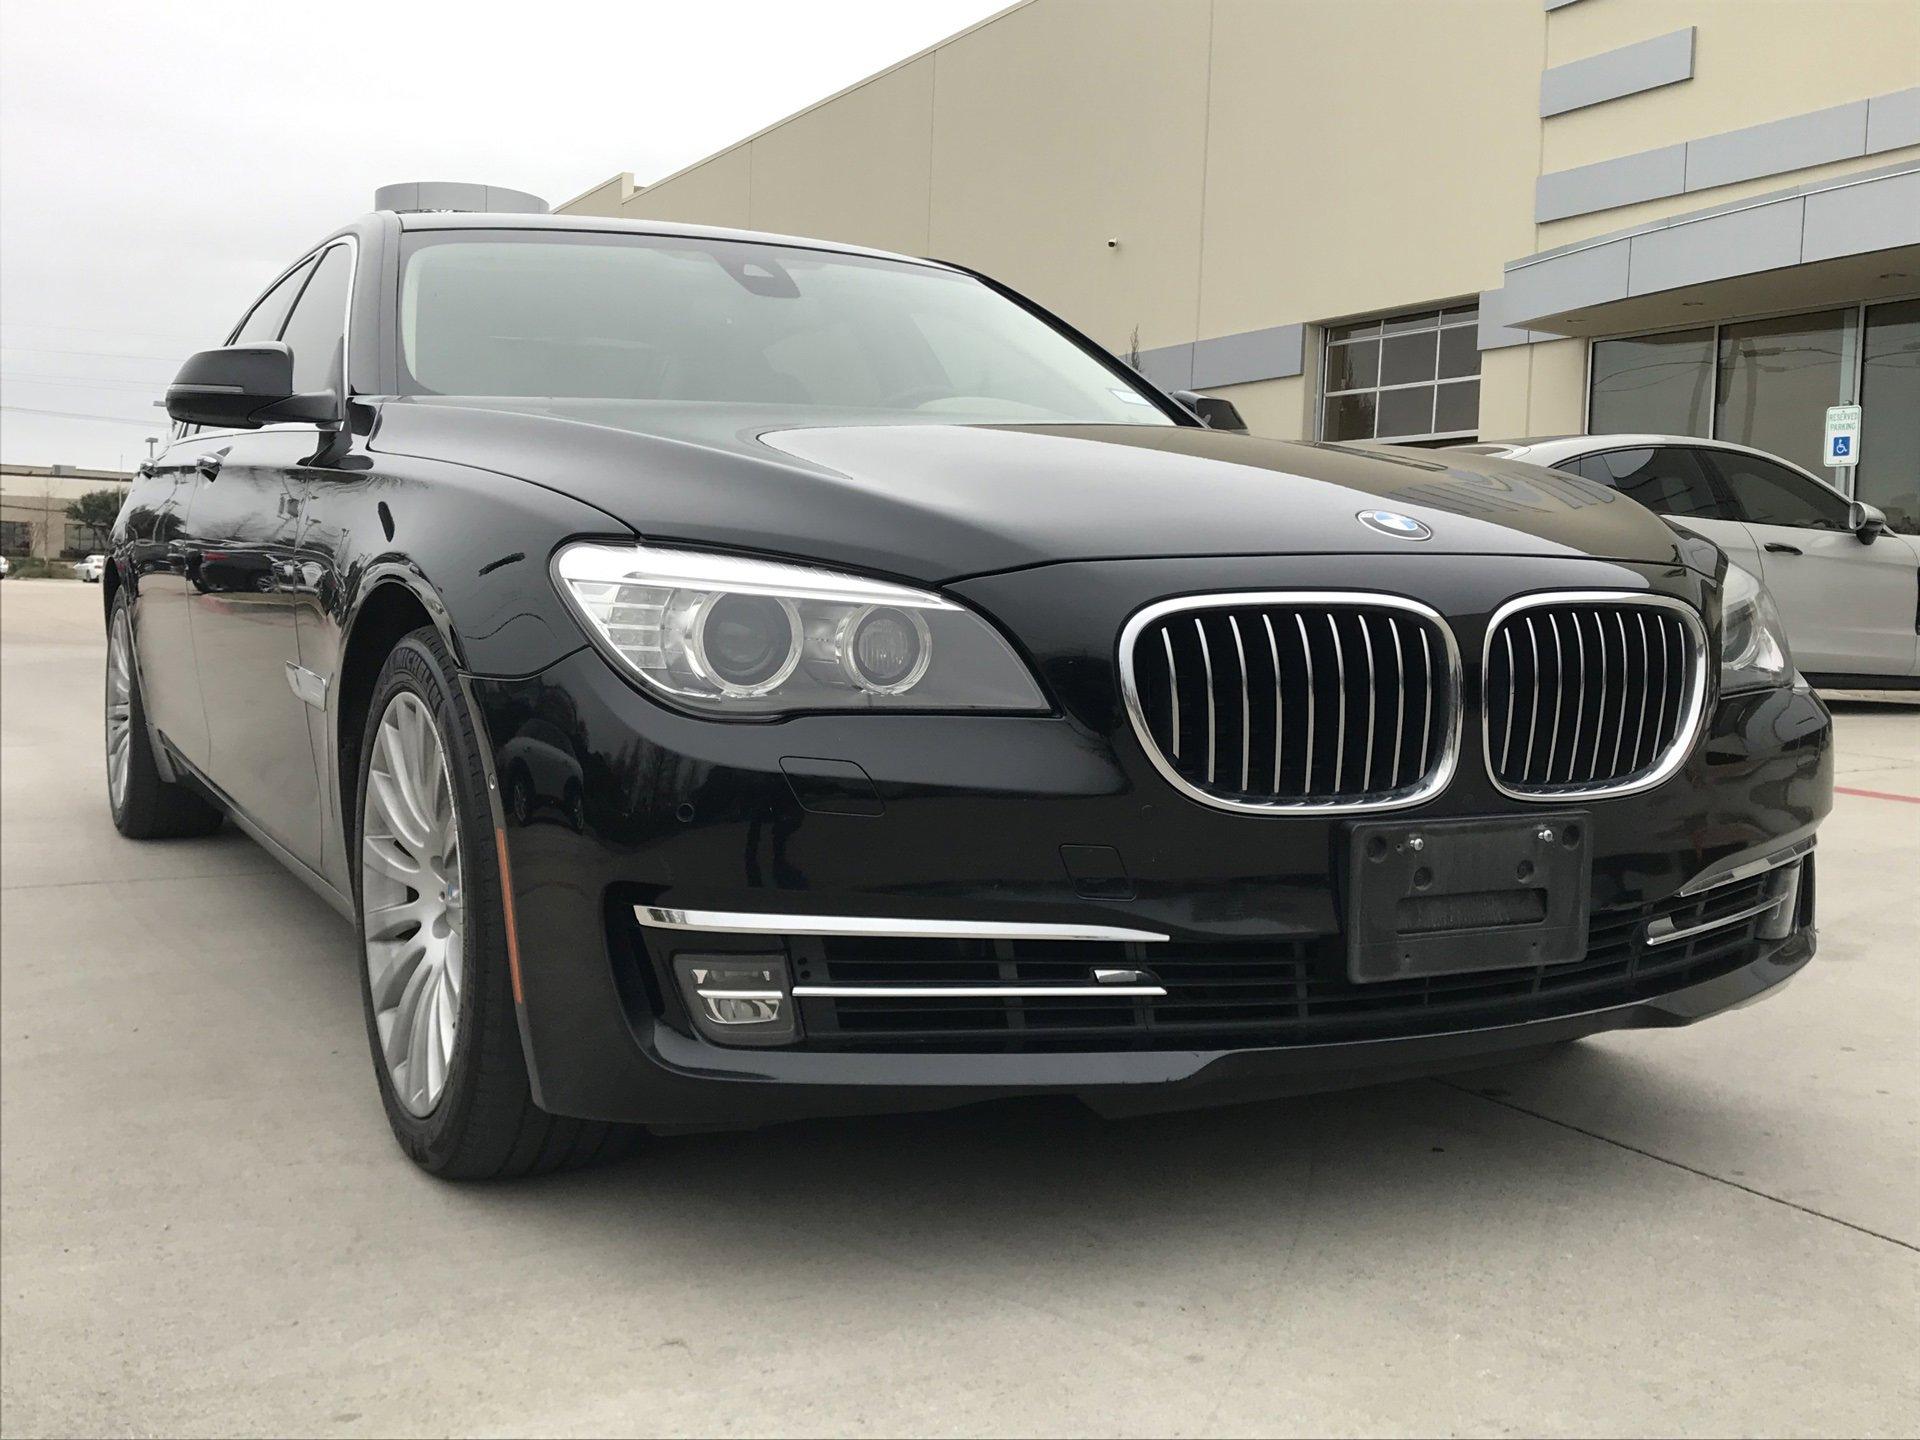 2013 BMW 750Li  image